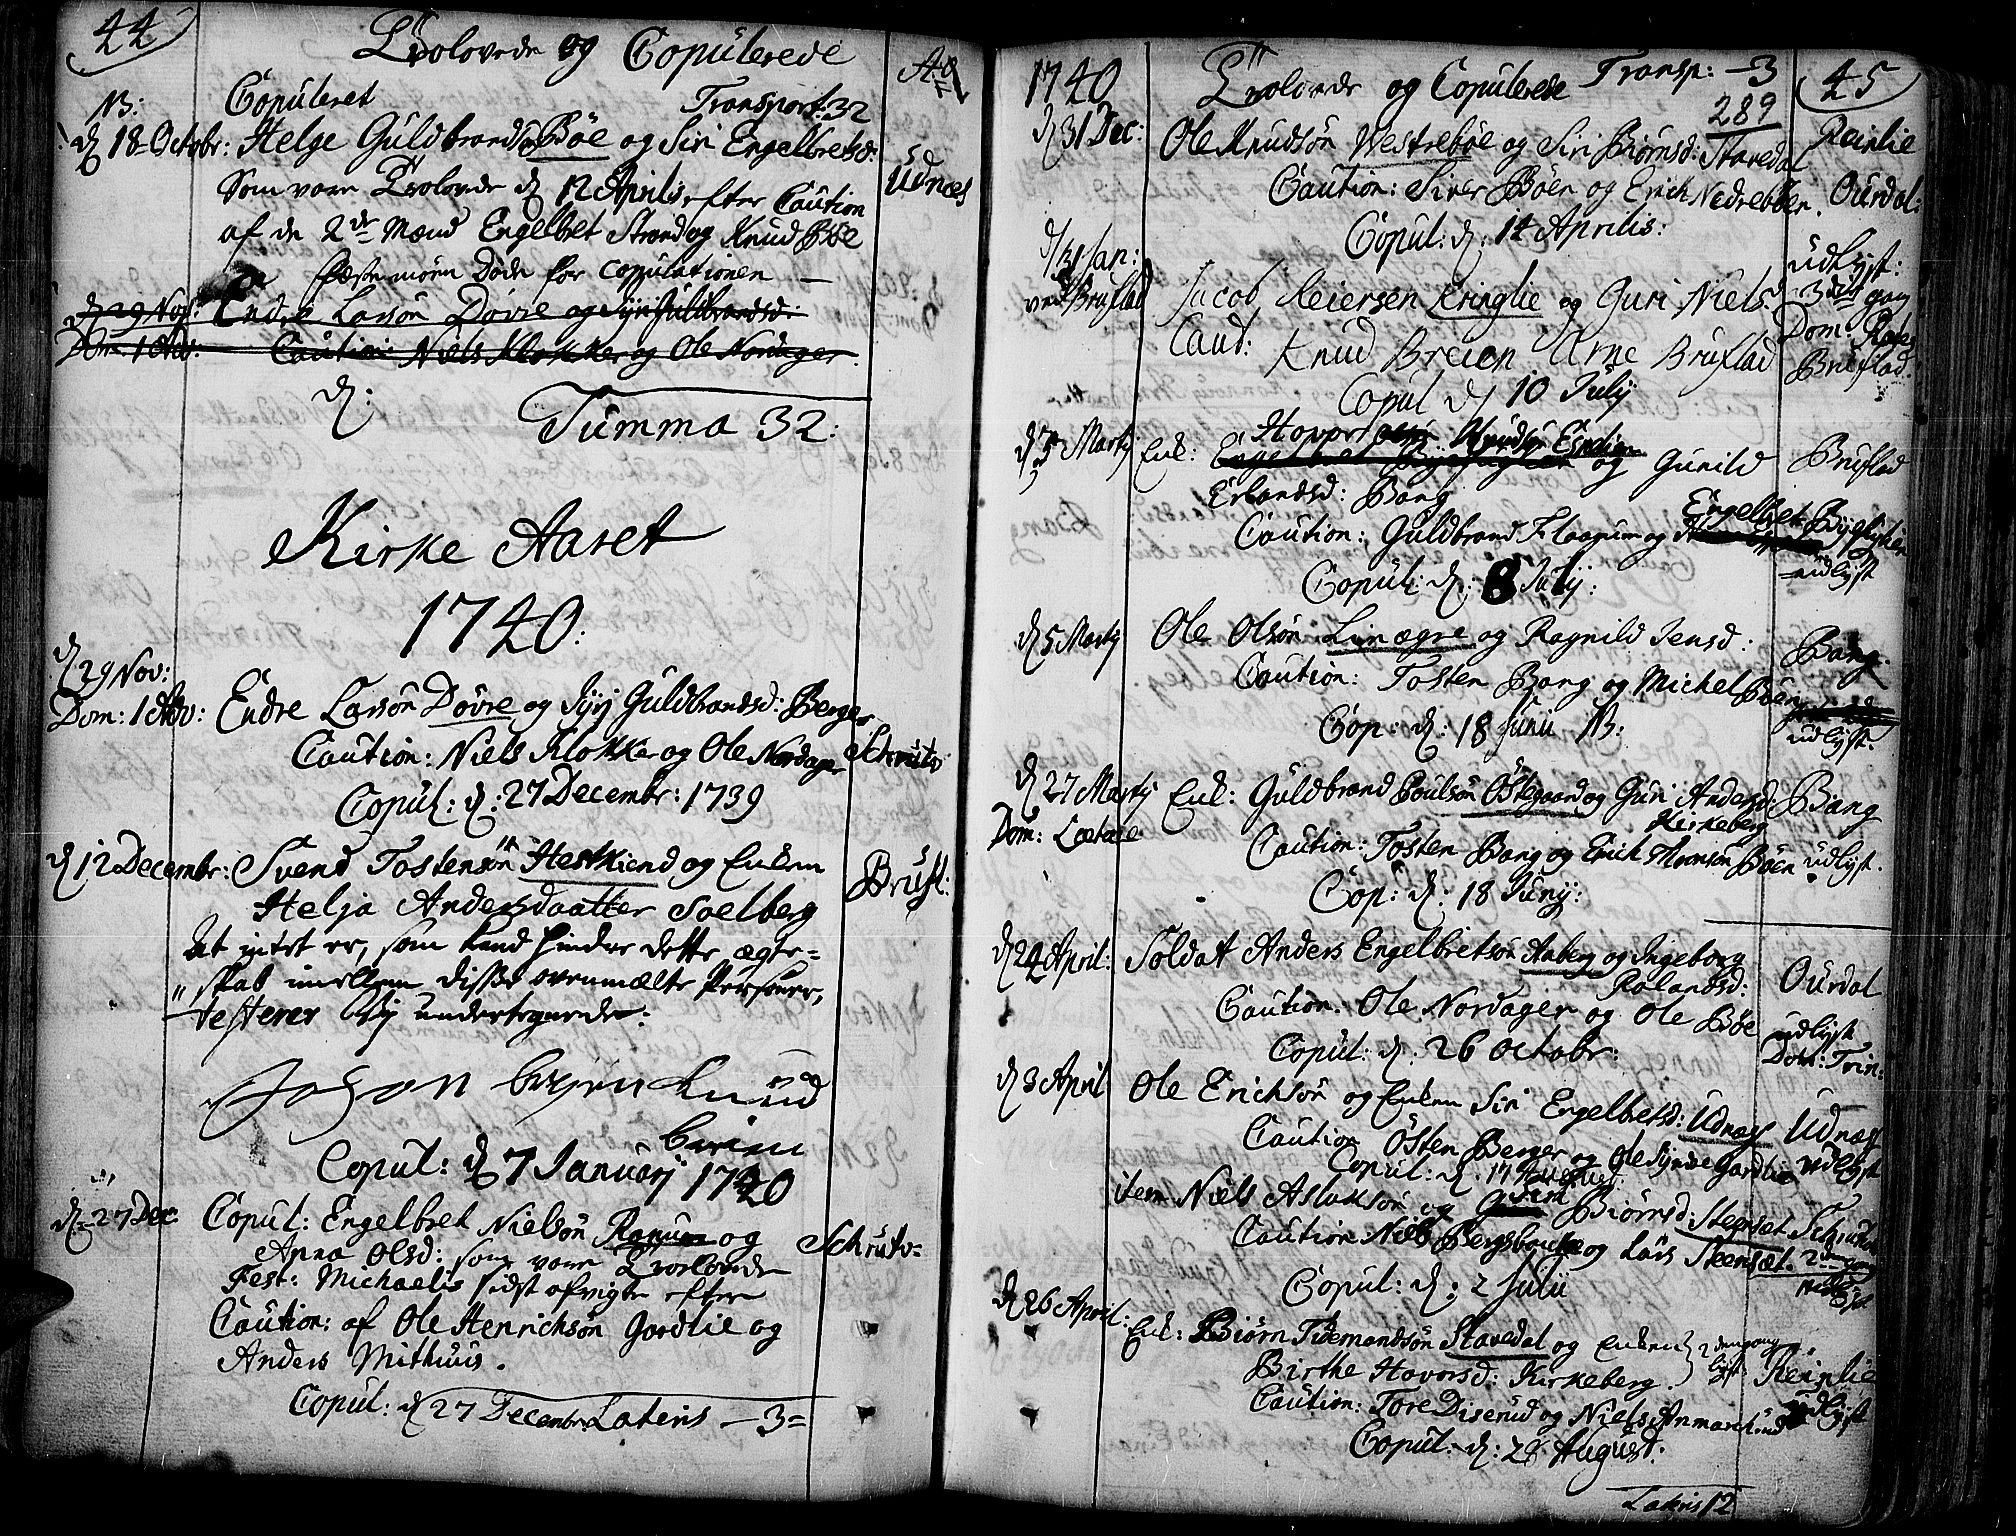 SAH, Aurdal prestekontor, Ministerialbok nr. 4, 1730-1762, s. 44-45